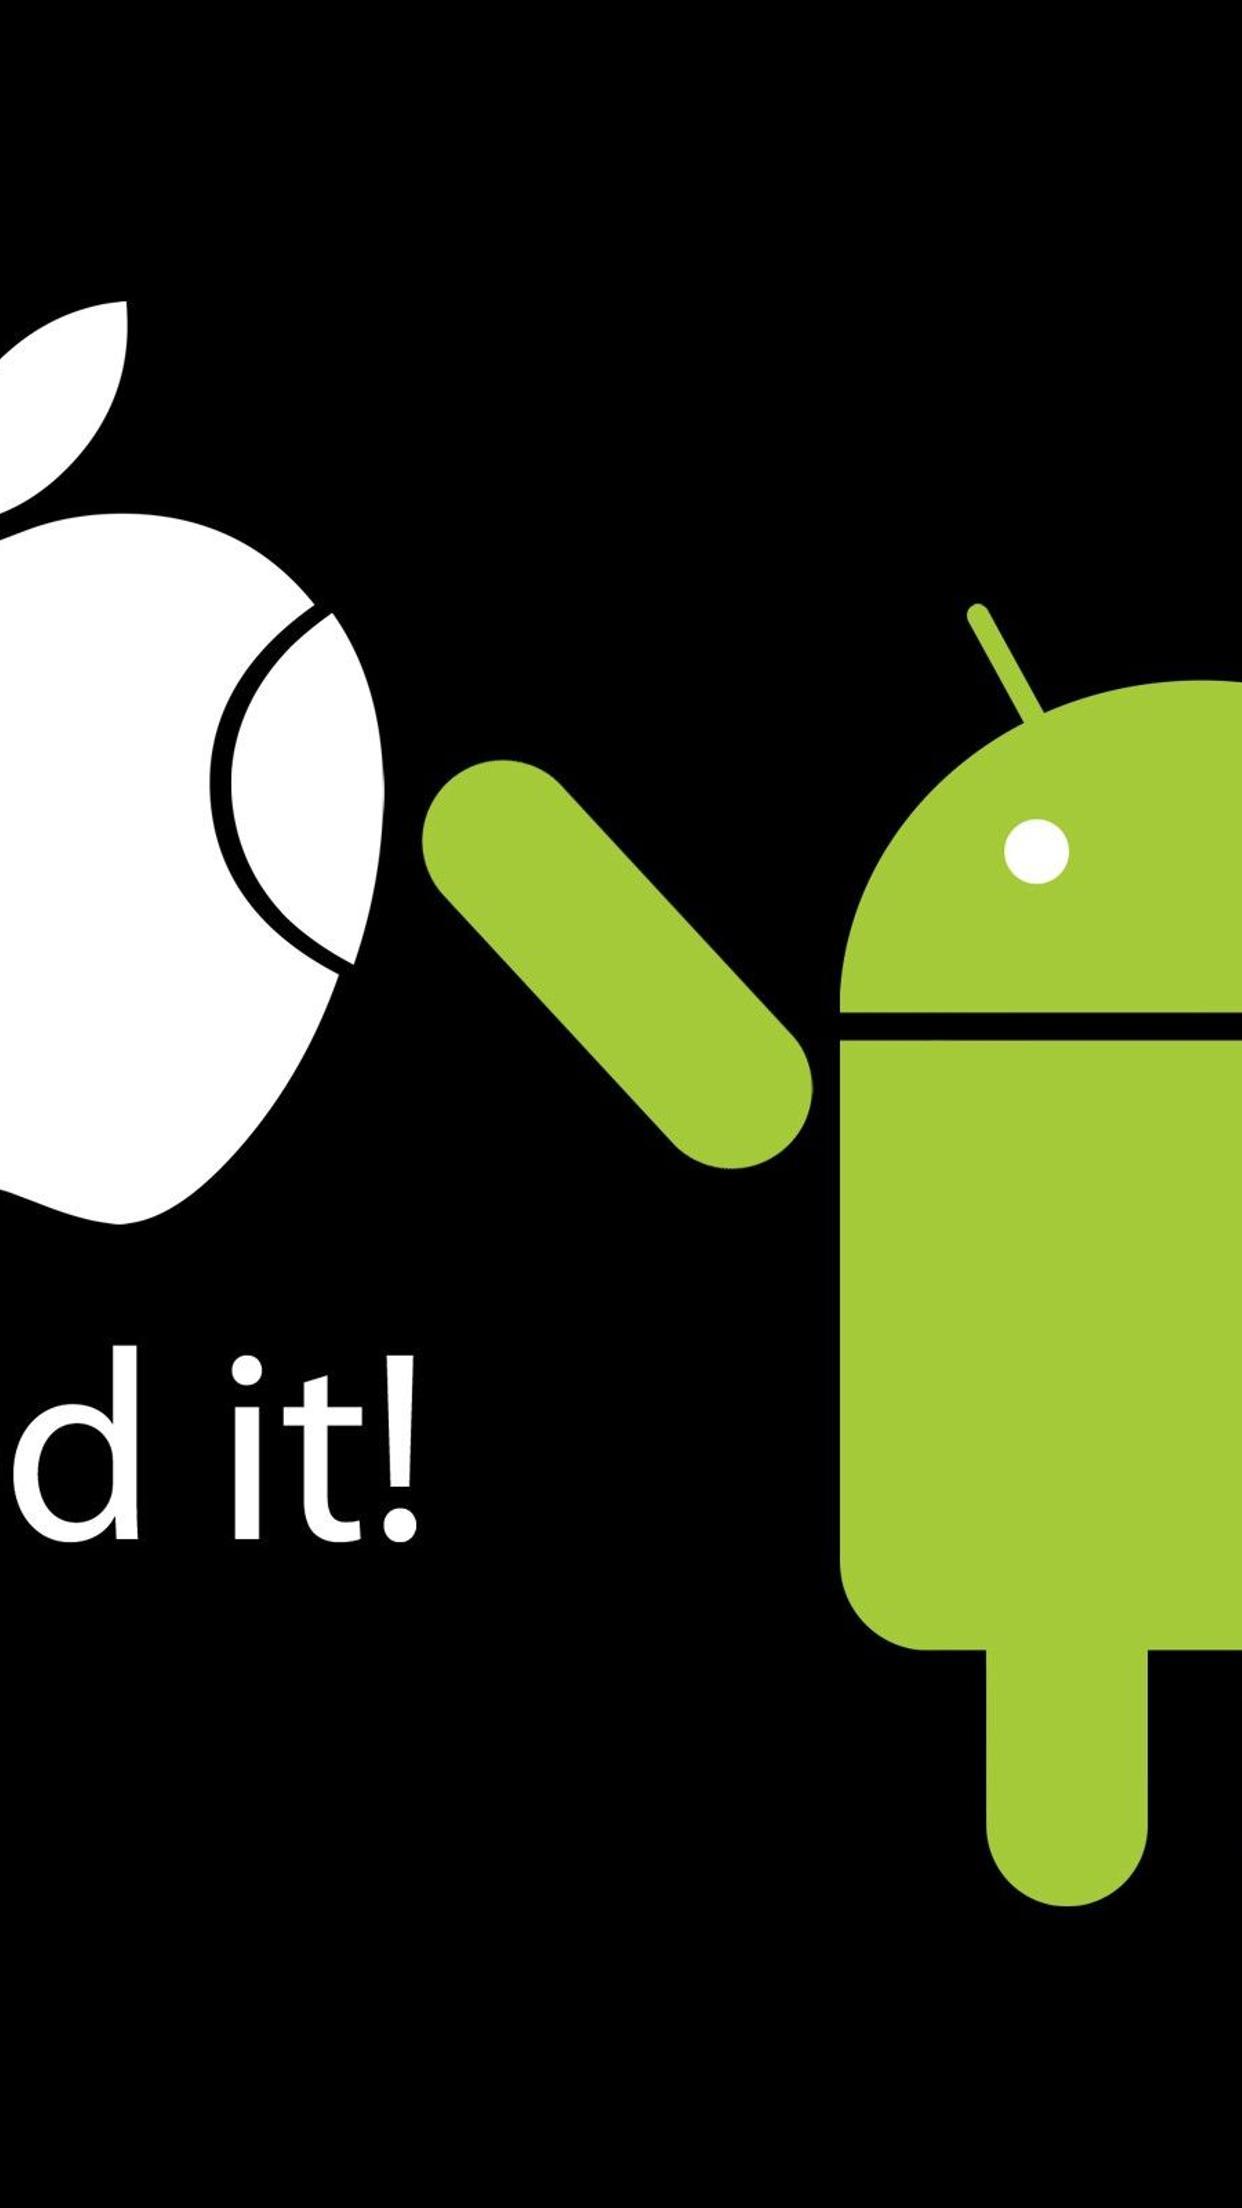 apple vs android i fixed it funny wallpaper wallpaper download 1242x2208